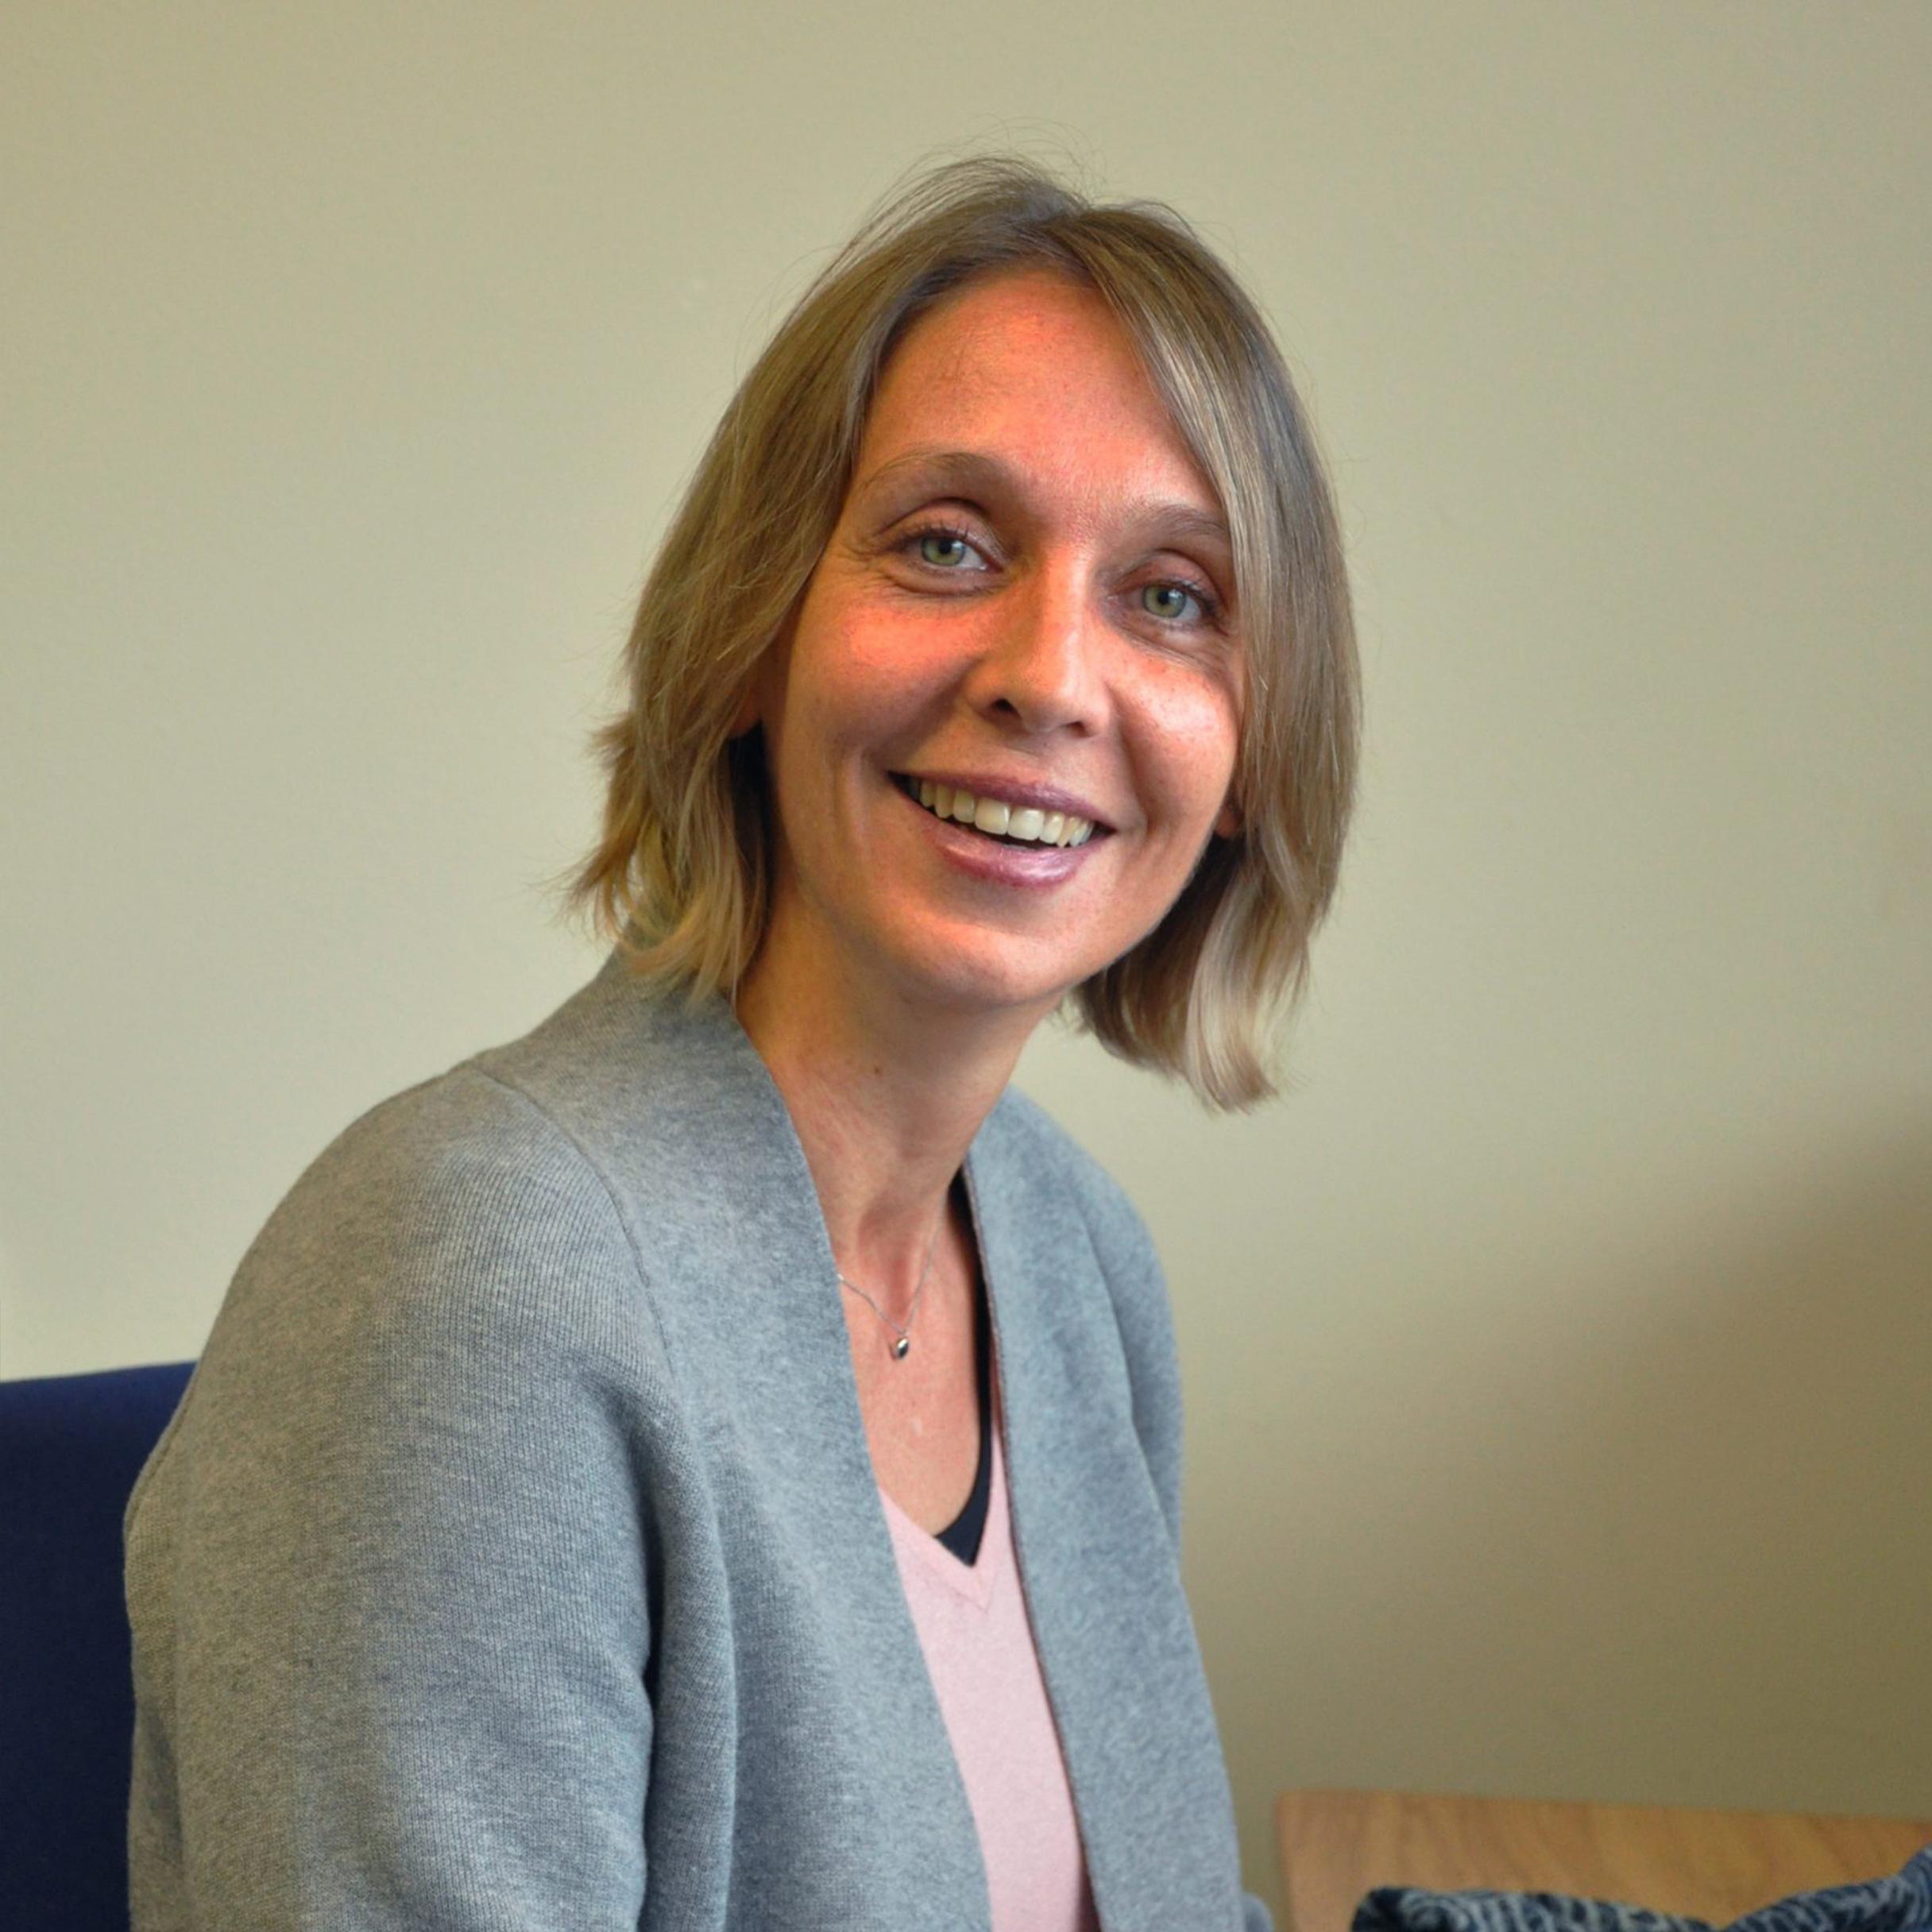 Dr Anne-Christine Poracchia-Kuhm